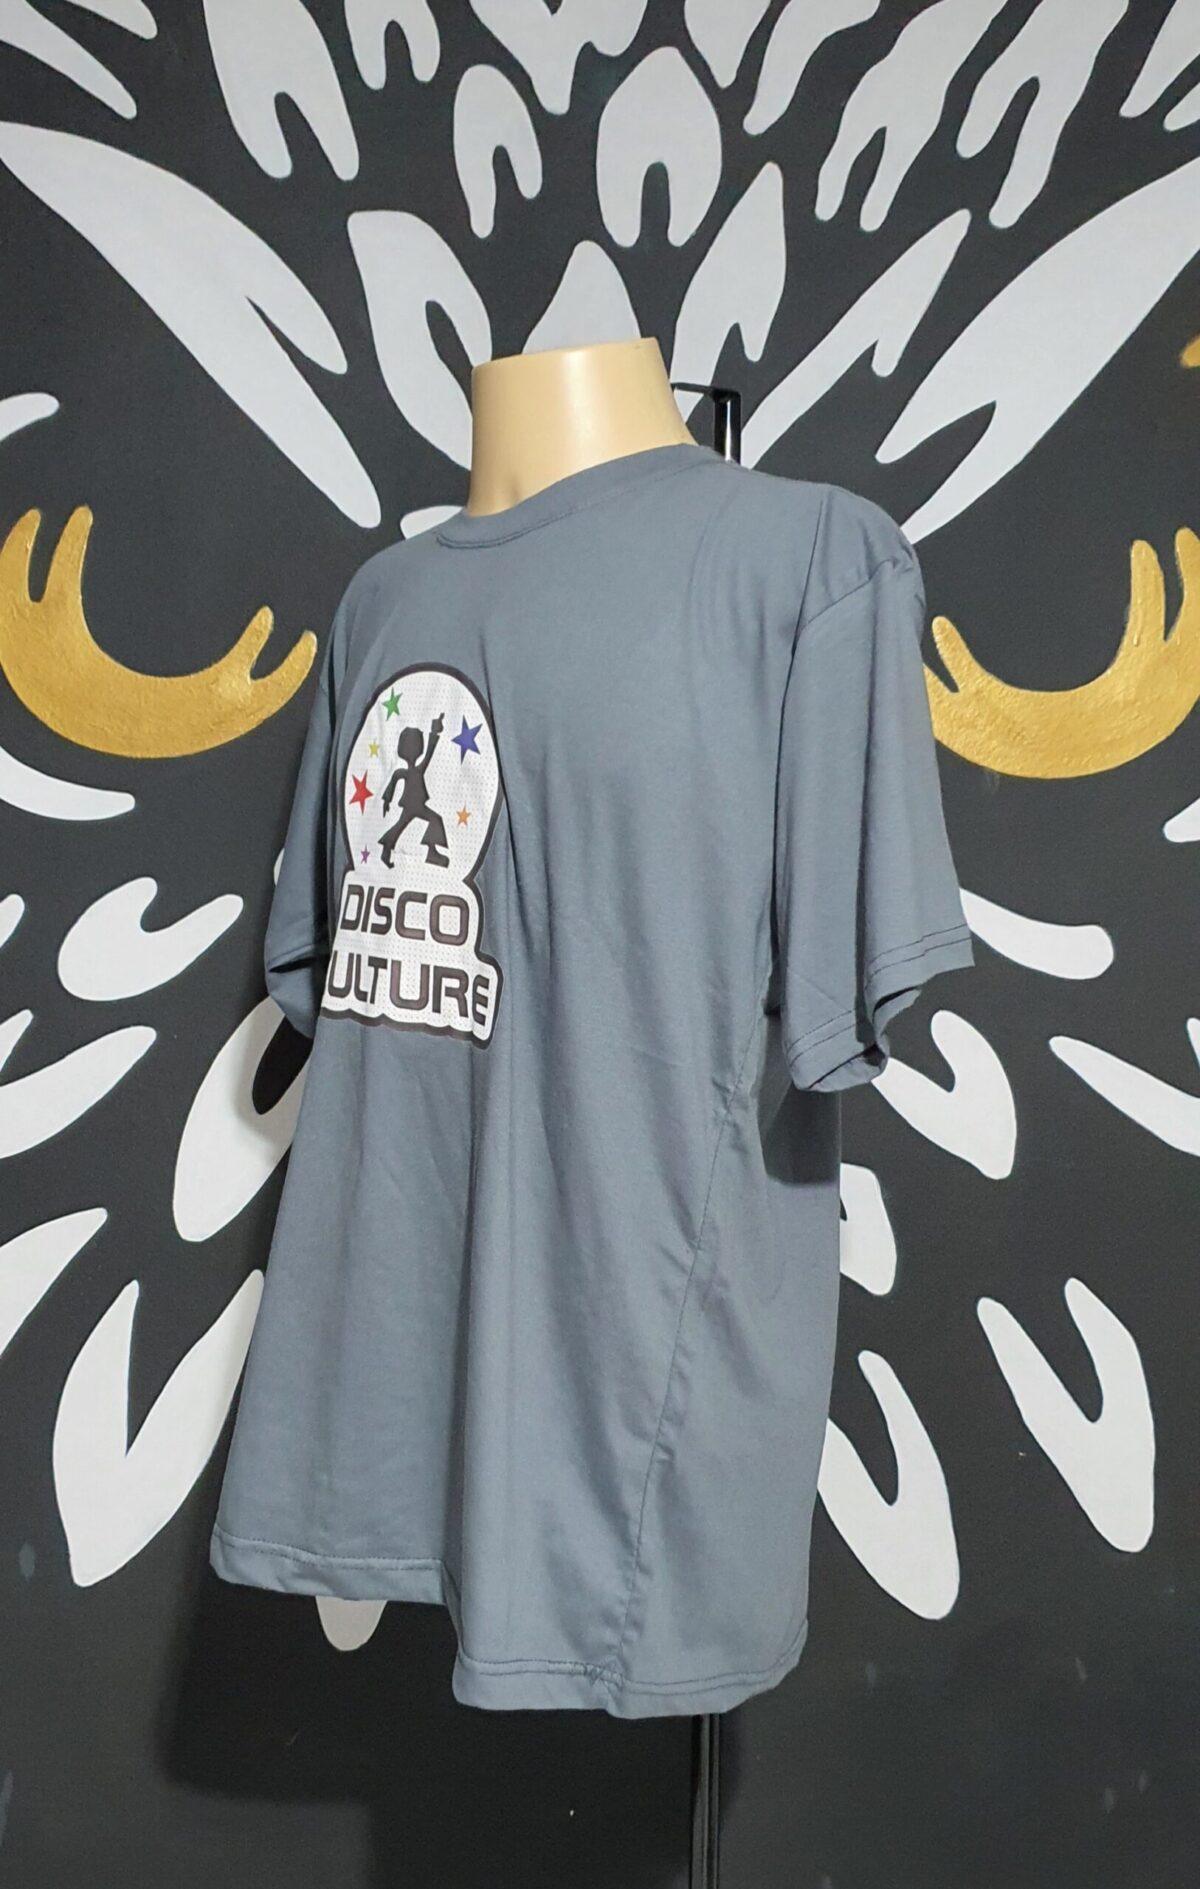 Camiseta Estampada Disco Culture by Bordado & Cia Custom - @bordado.cia #bordadoecia